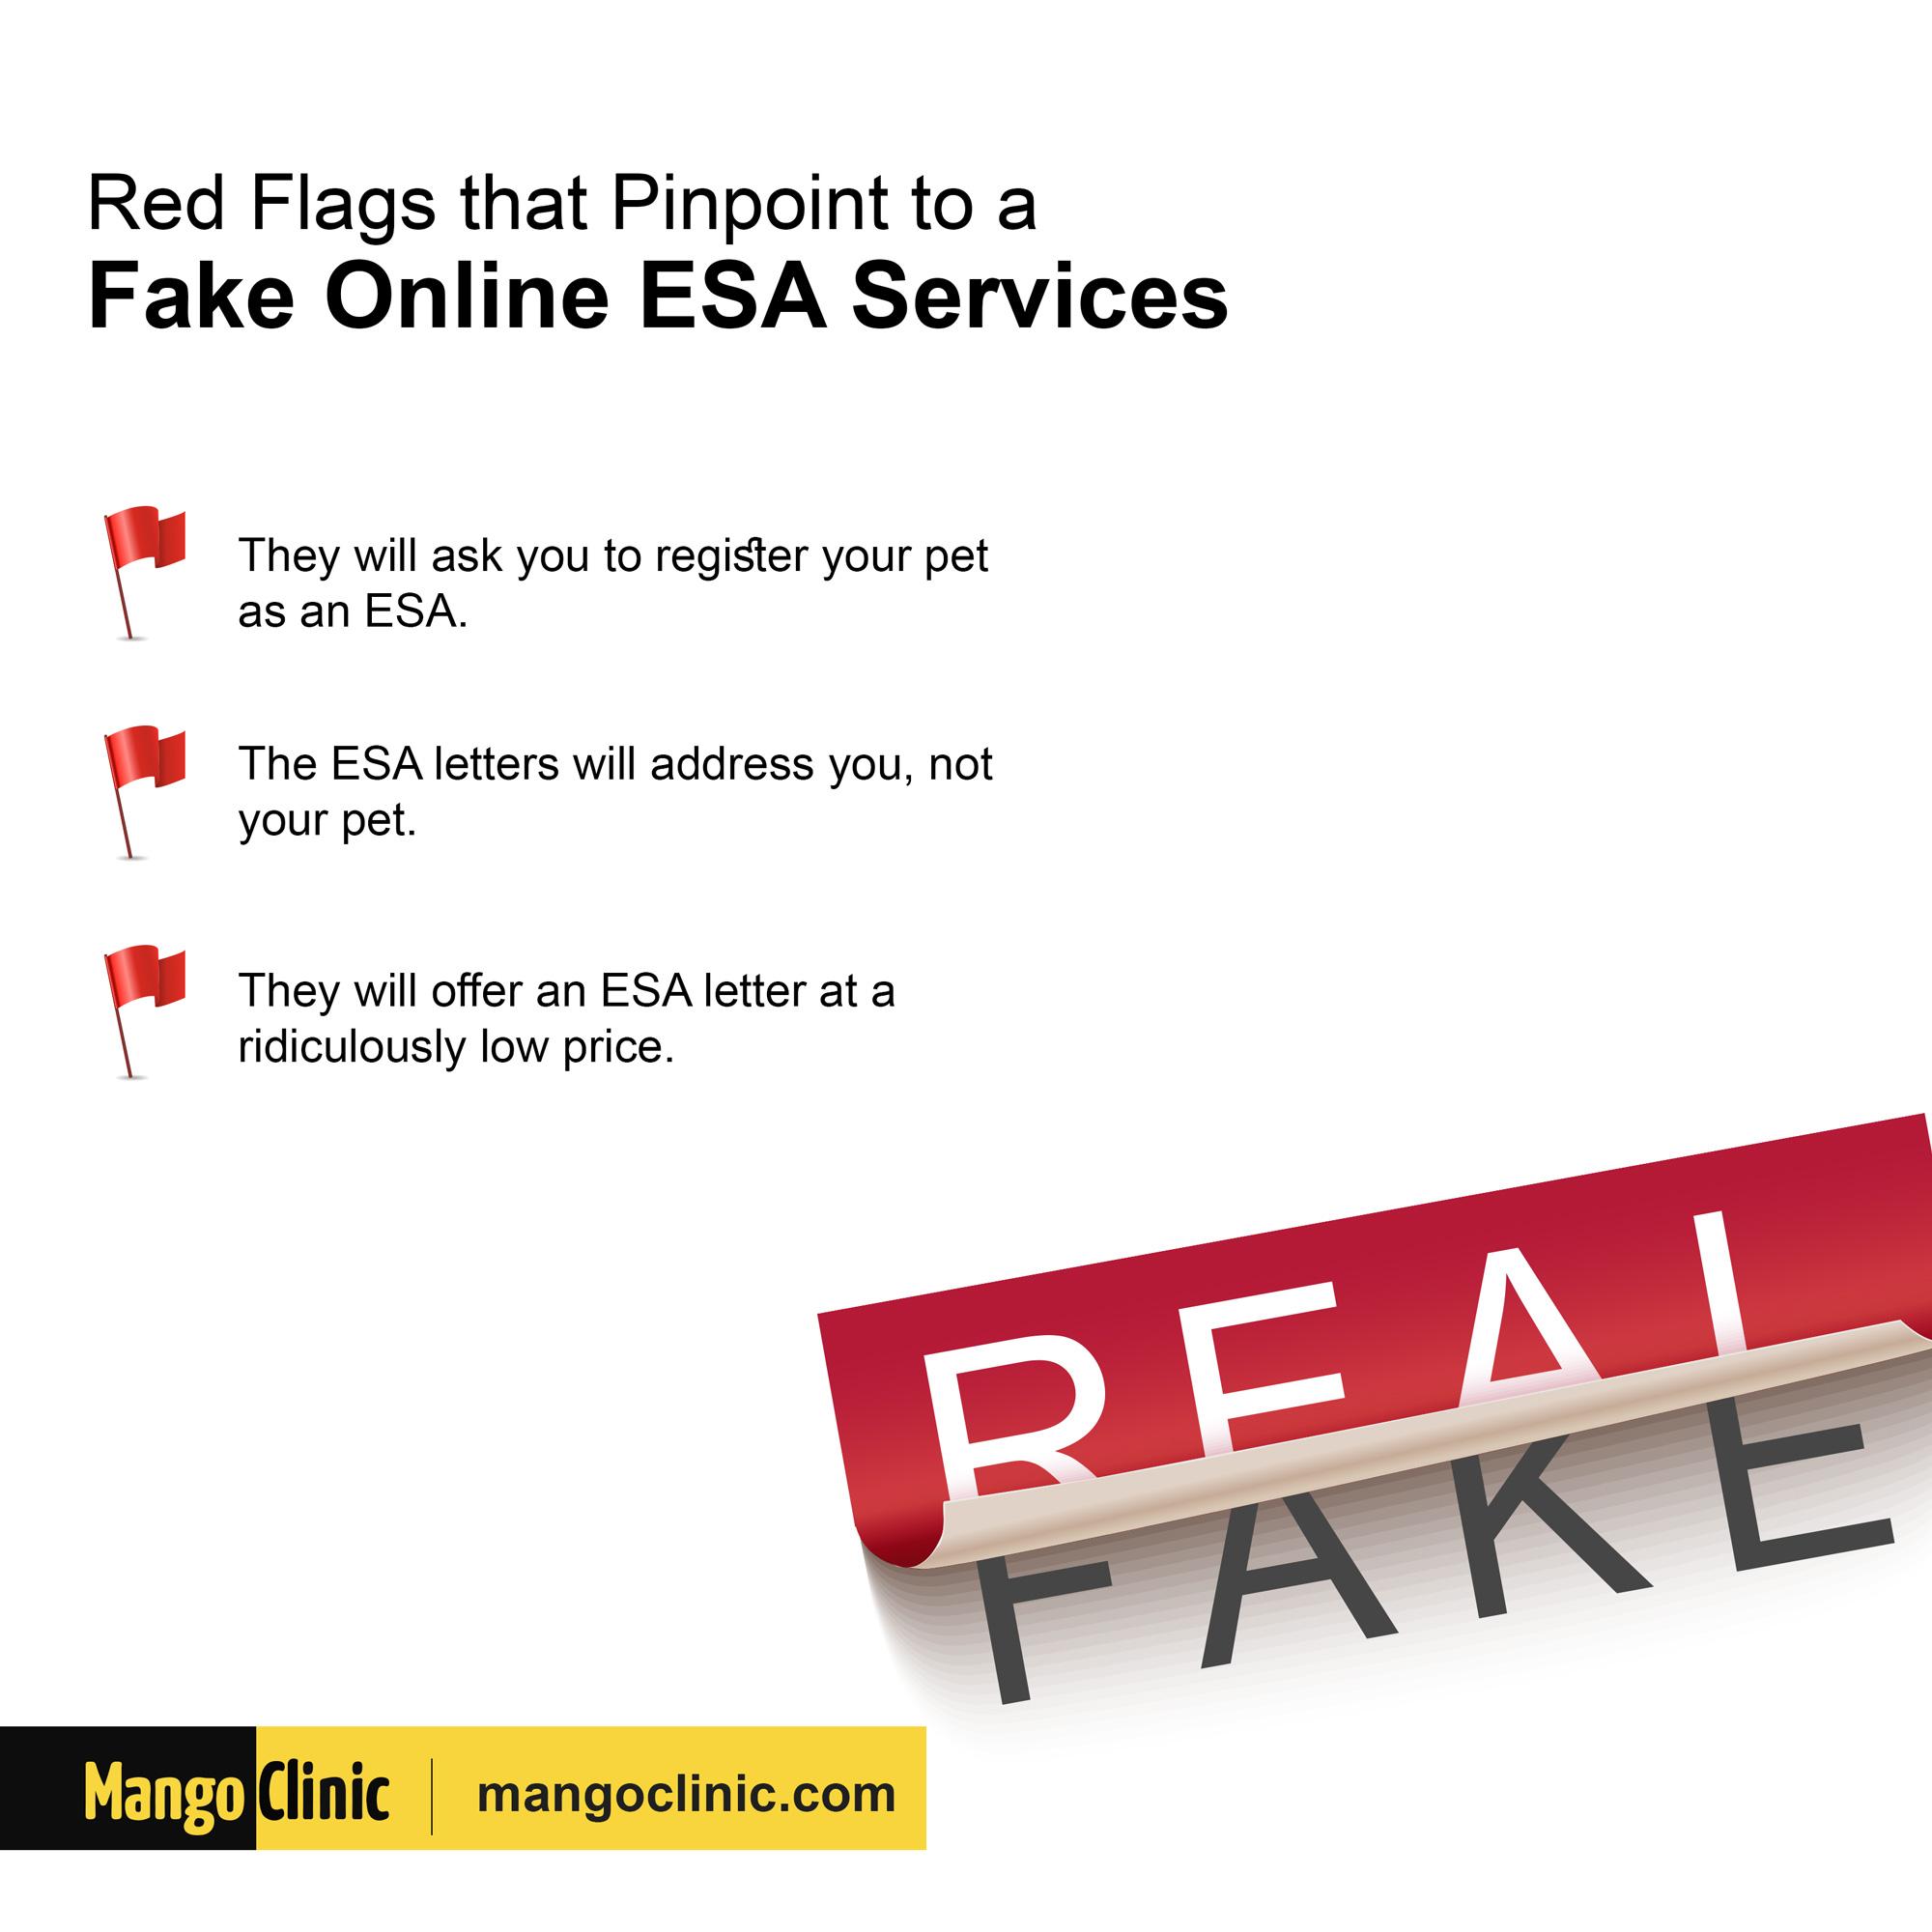 How to spot fake ESA service